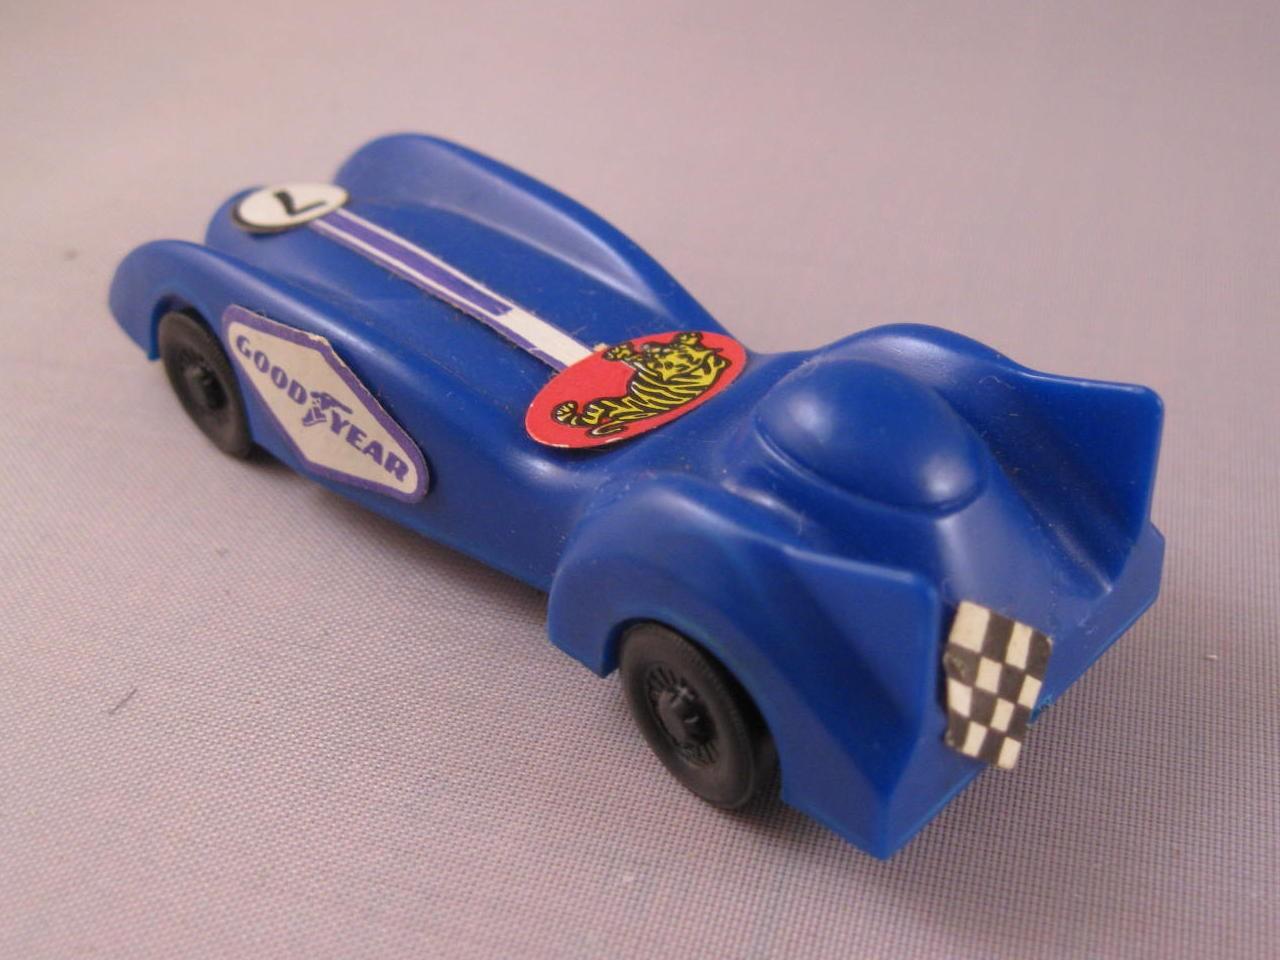 Car Toys Aurora Co: The Batmobile Show: THE 1973 JVZ CEREAL CAR PROTO-BATMOBILE